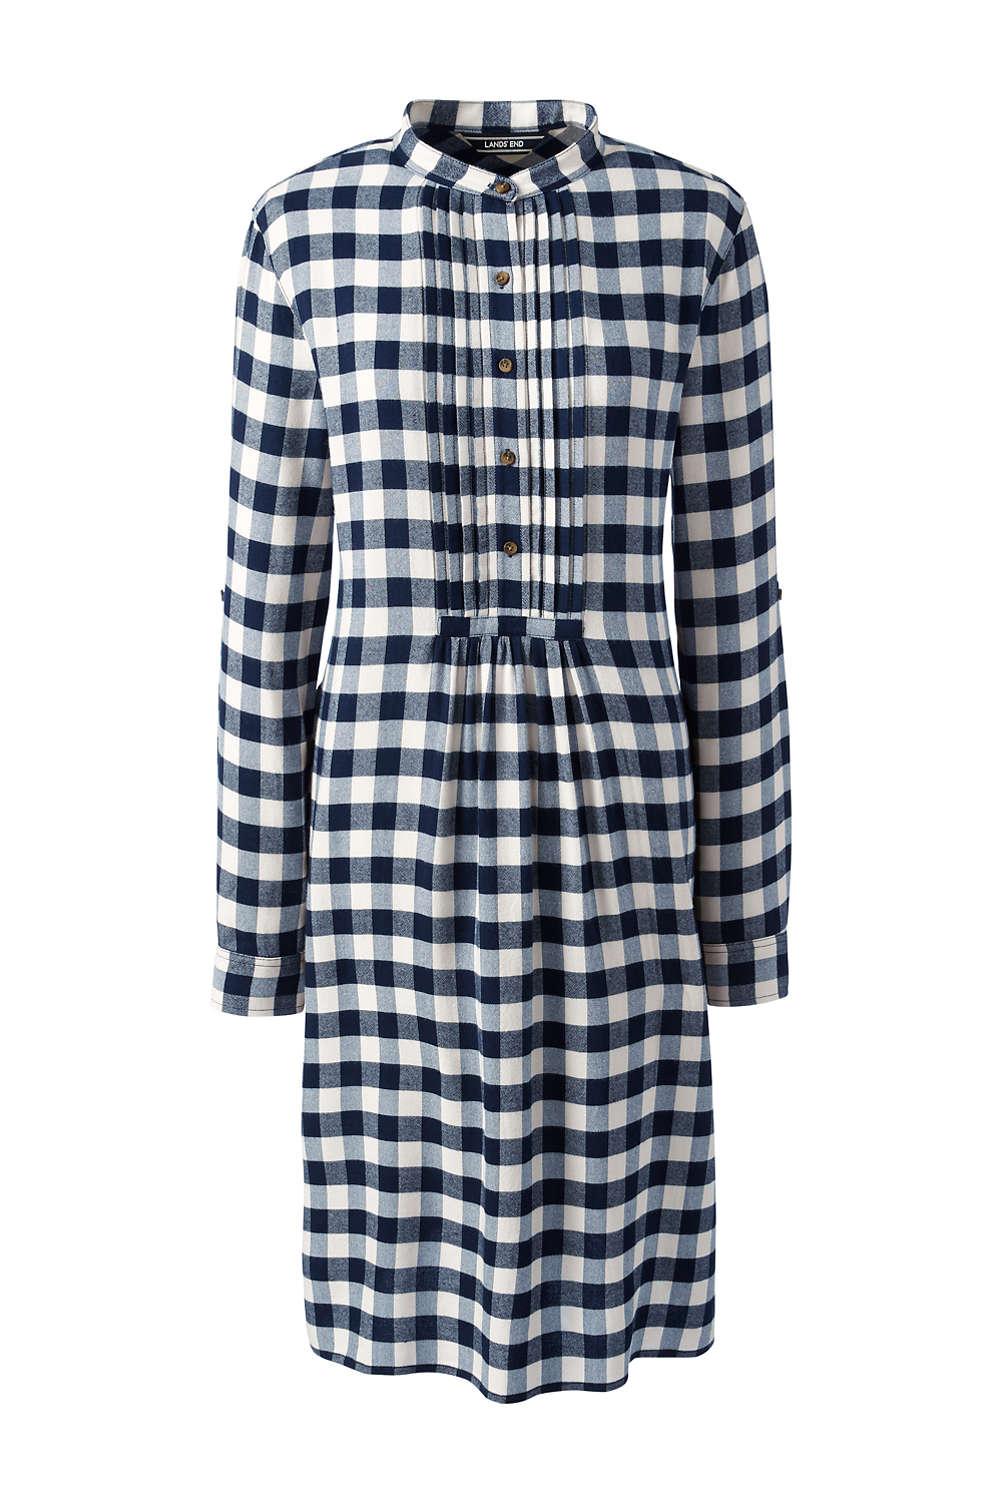 durable service buy reasonable price Women's Long Sleeve Print Tuxedo Bib Shirt Dress